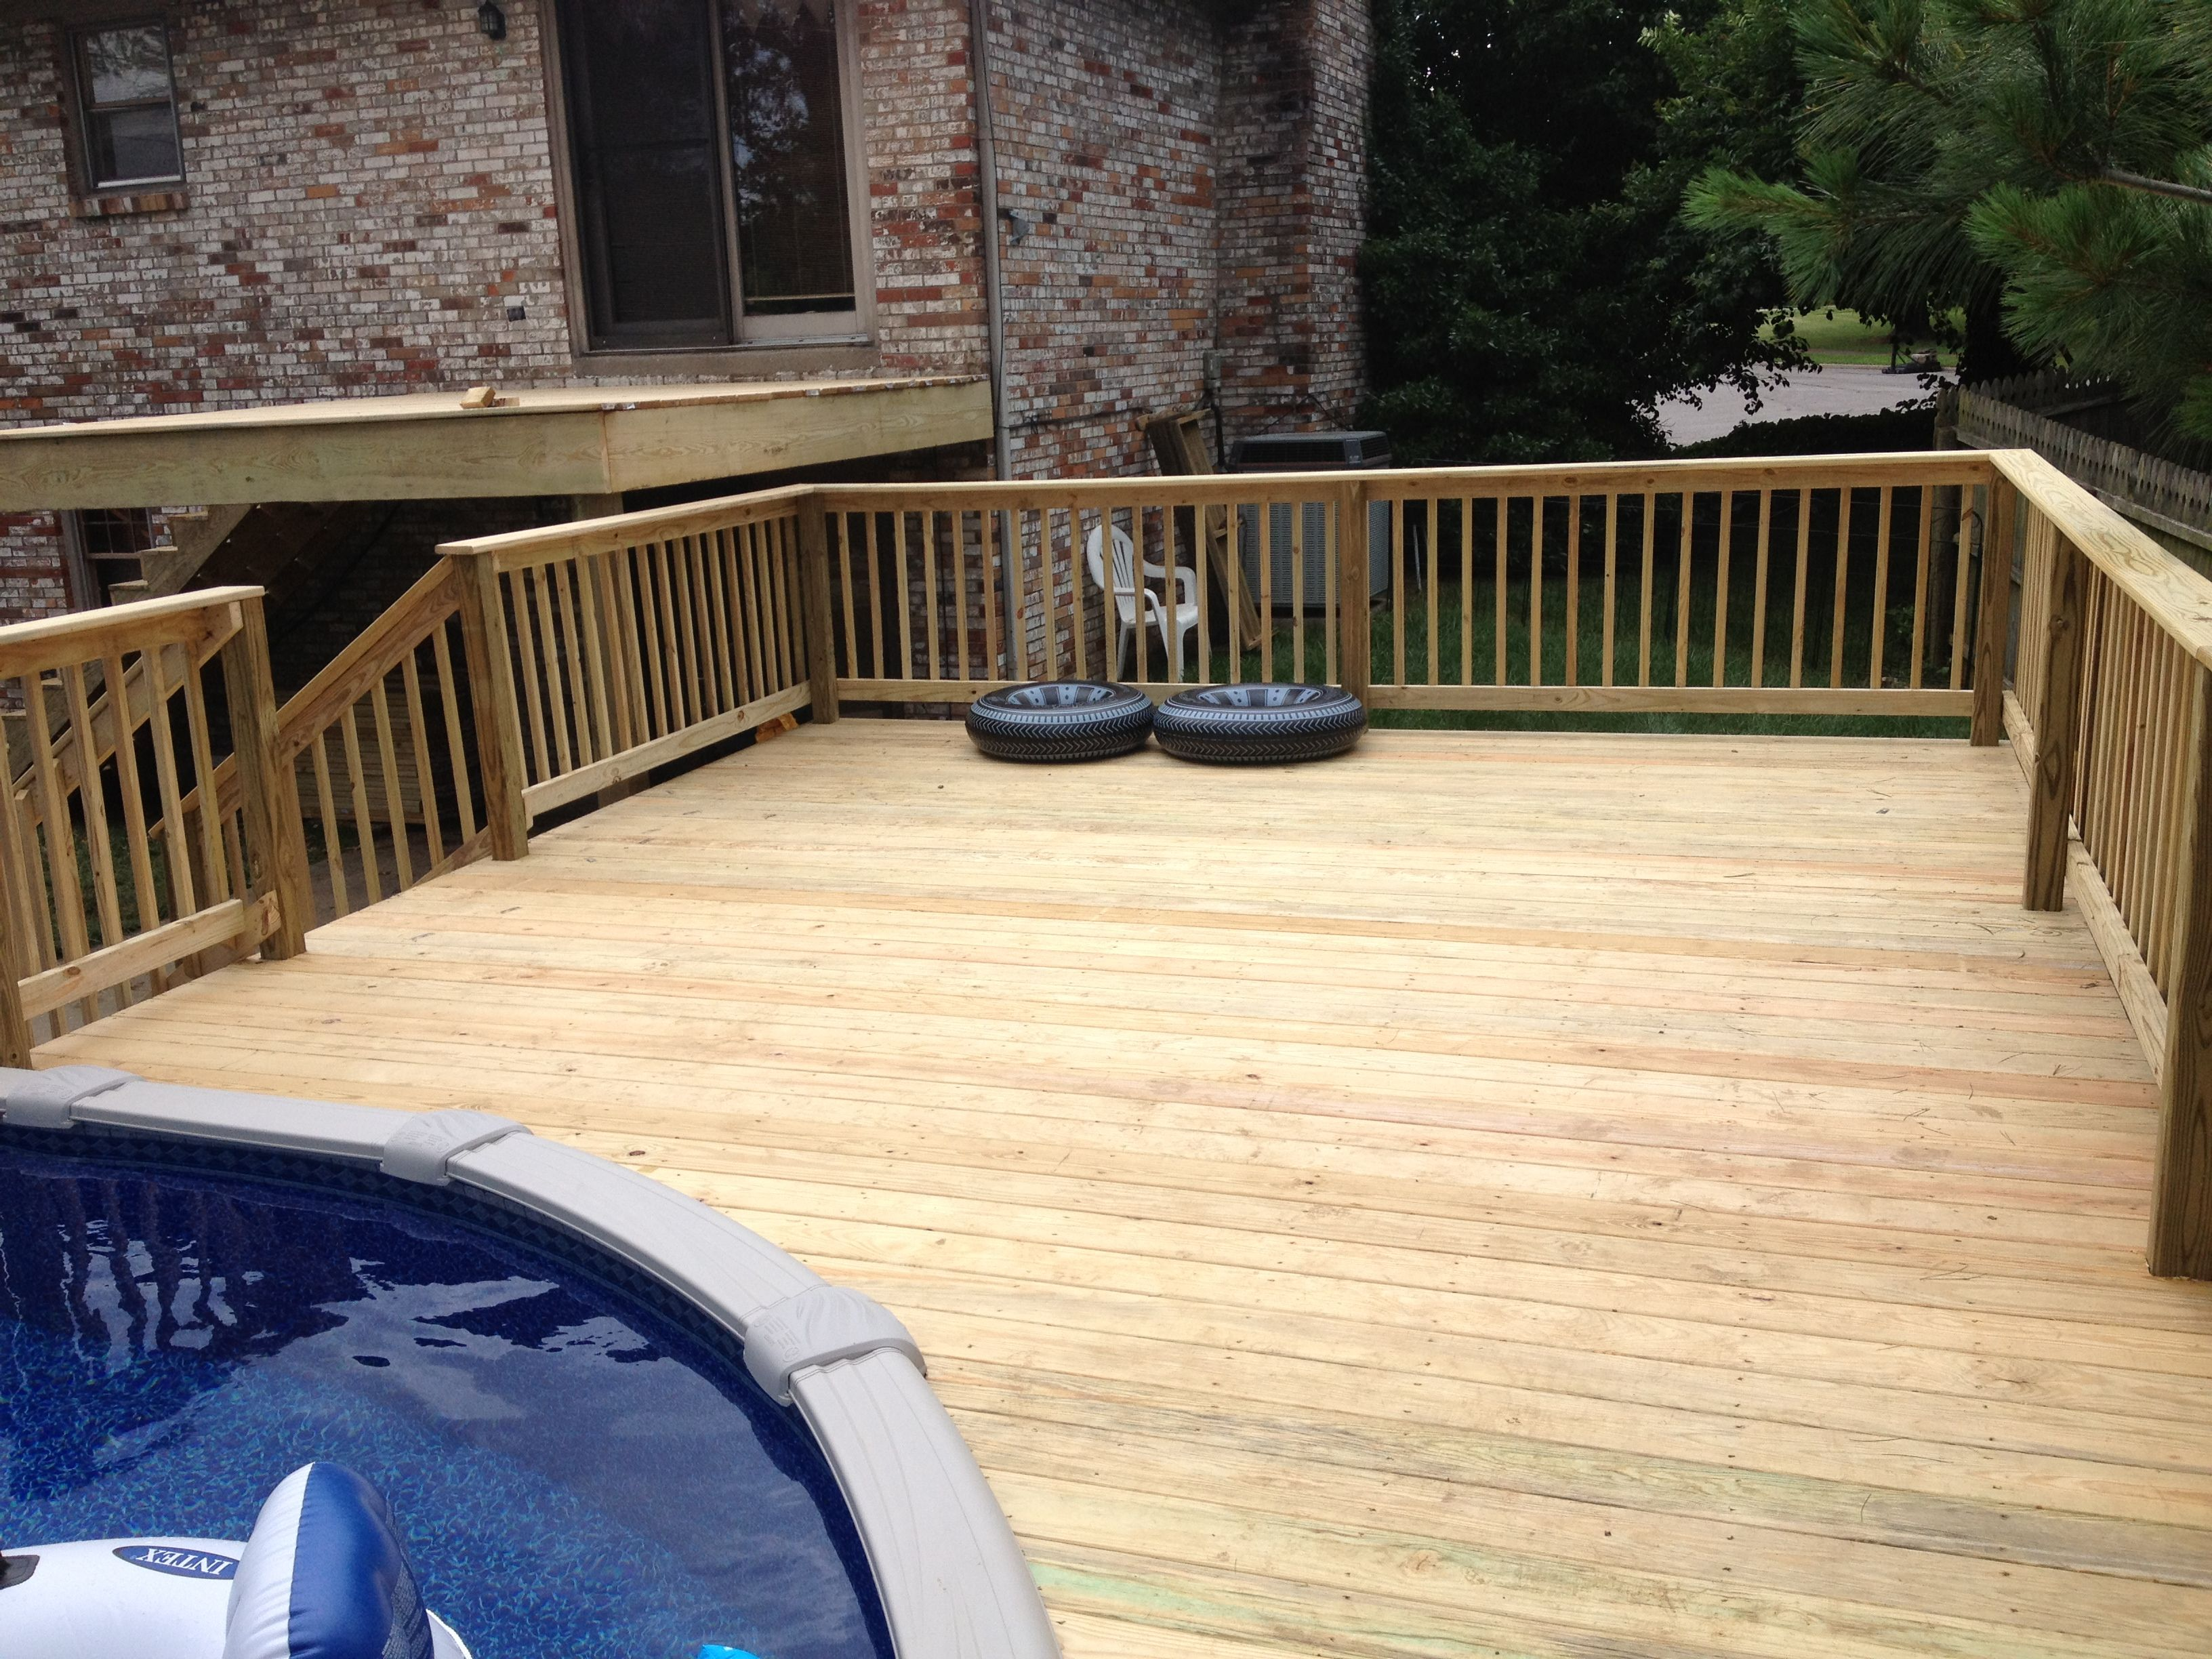 Wood pool deck wood decks pinterest for Pool wood deck ideas